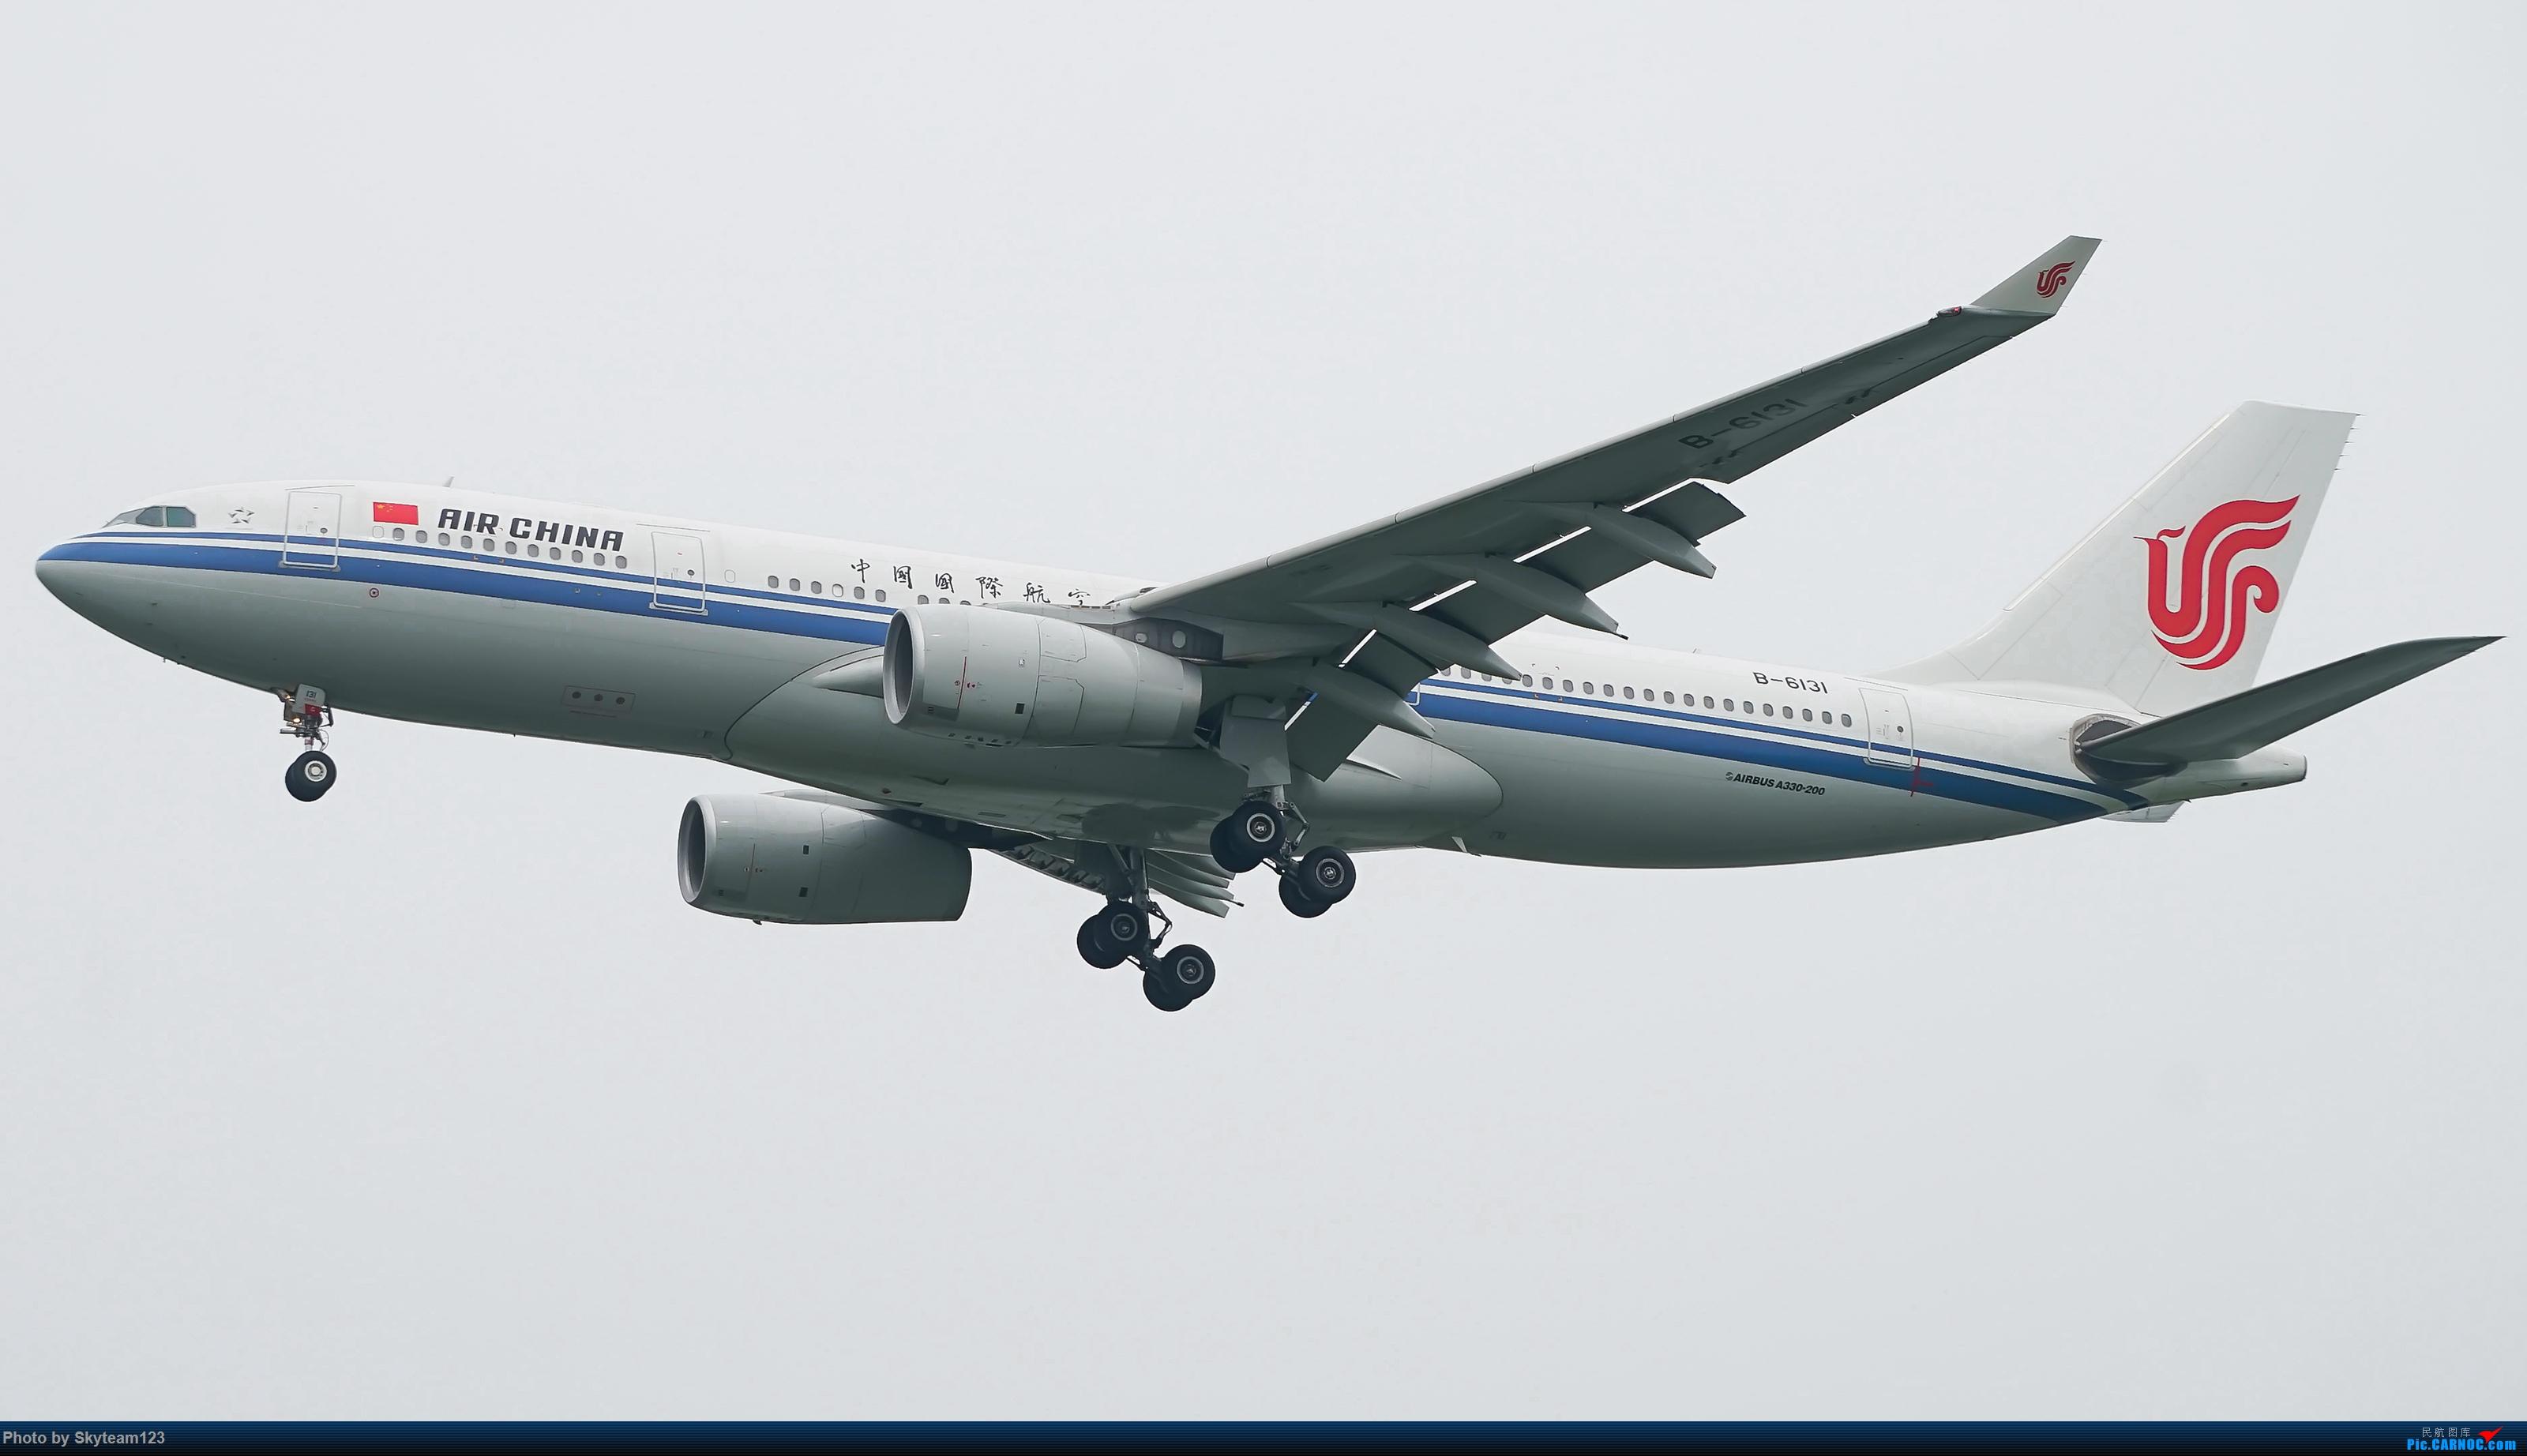 Re:《Simon游记》第六季第八集 CZ3101&CZ3000 南航全新波音78W经济舱体验&详细测评 PEK八卦台烂天拍机 及回程A388上层公务舱记录 AIRBUS A330-200 B-6131 中国北京首都国际机场